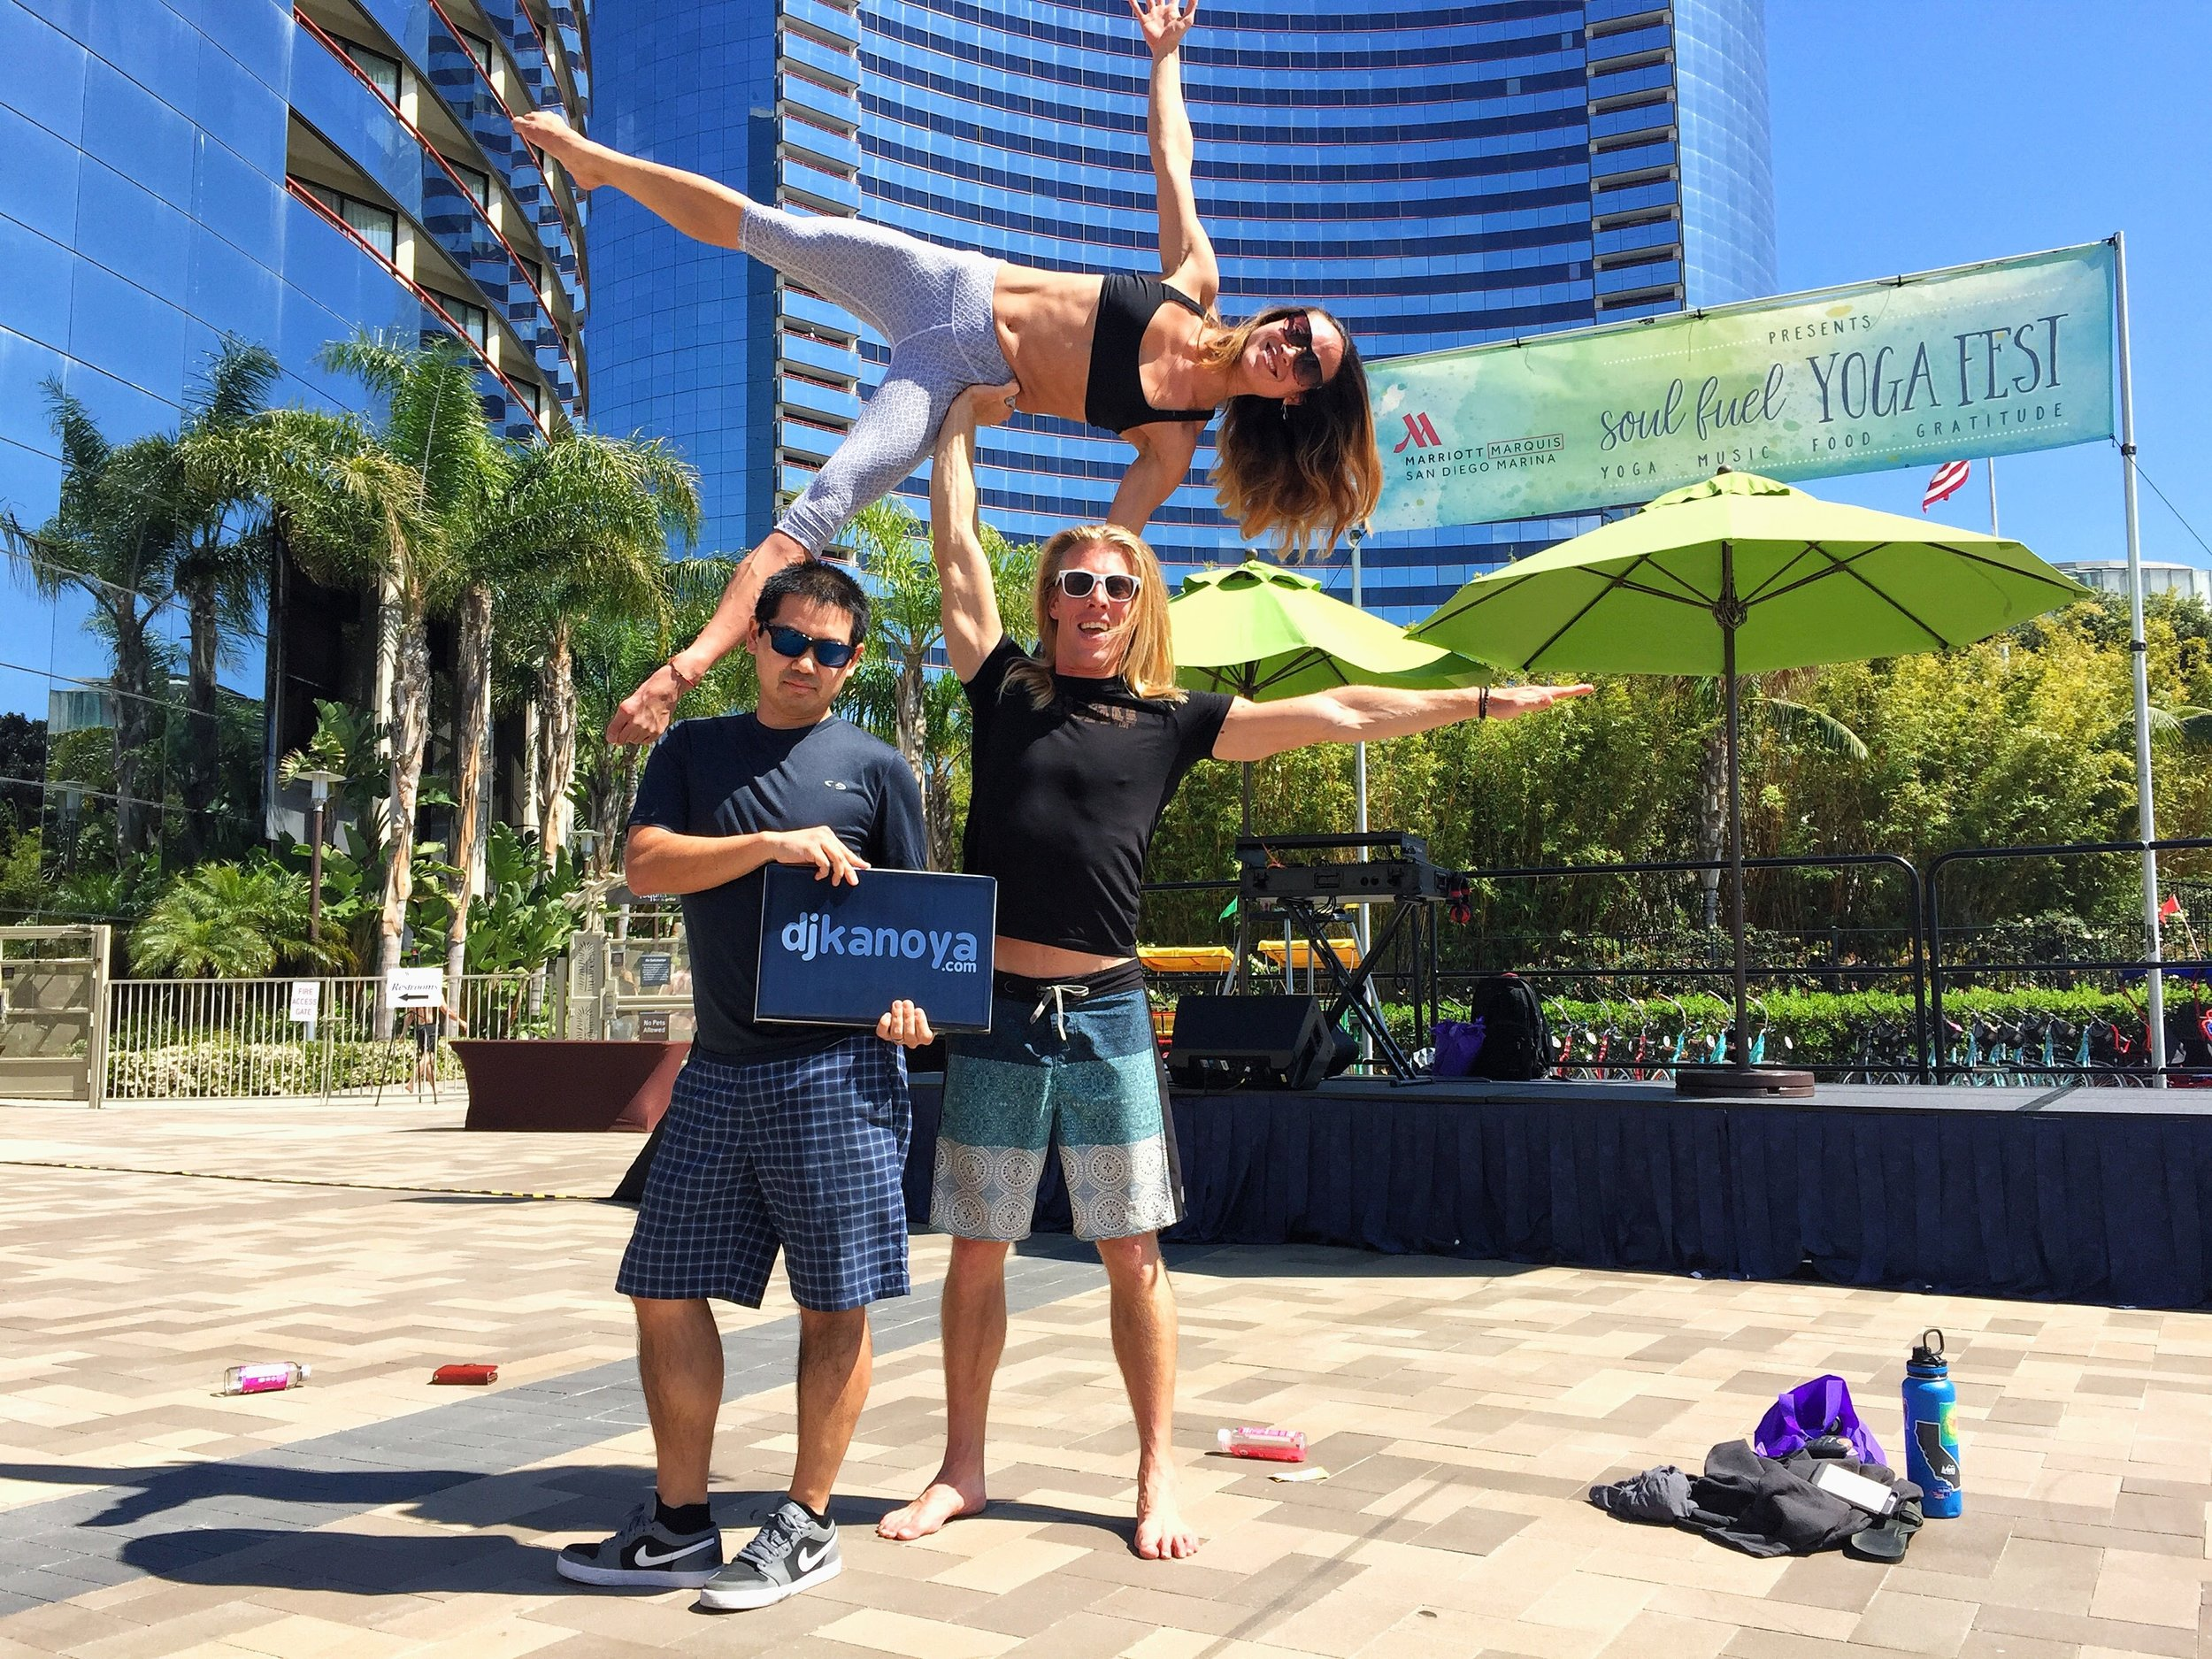 San Diego yoga DJ justin Kanoya poses with acroyoga performers Steven Cumming and Gina Shiotani at the Soul Fuel Yoga Fest.